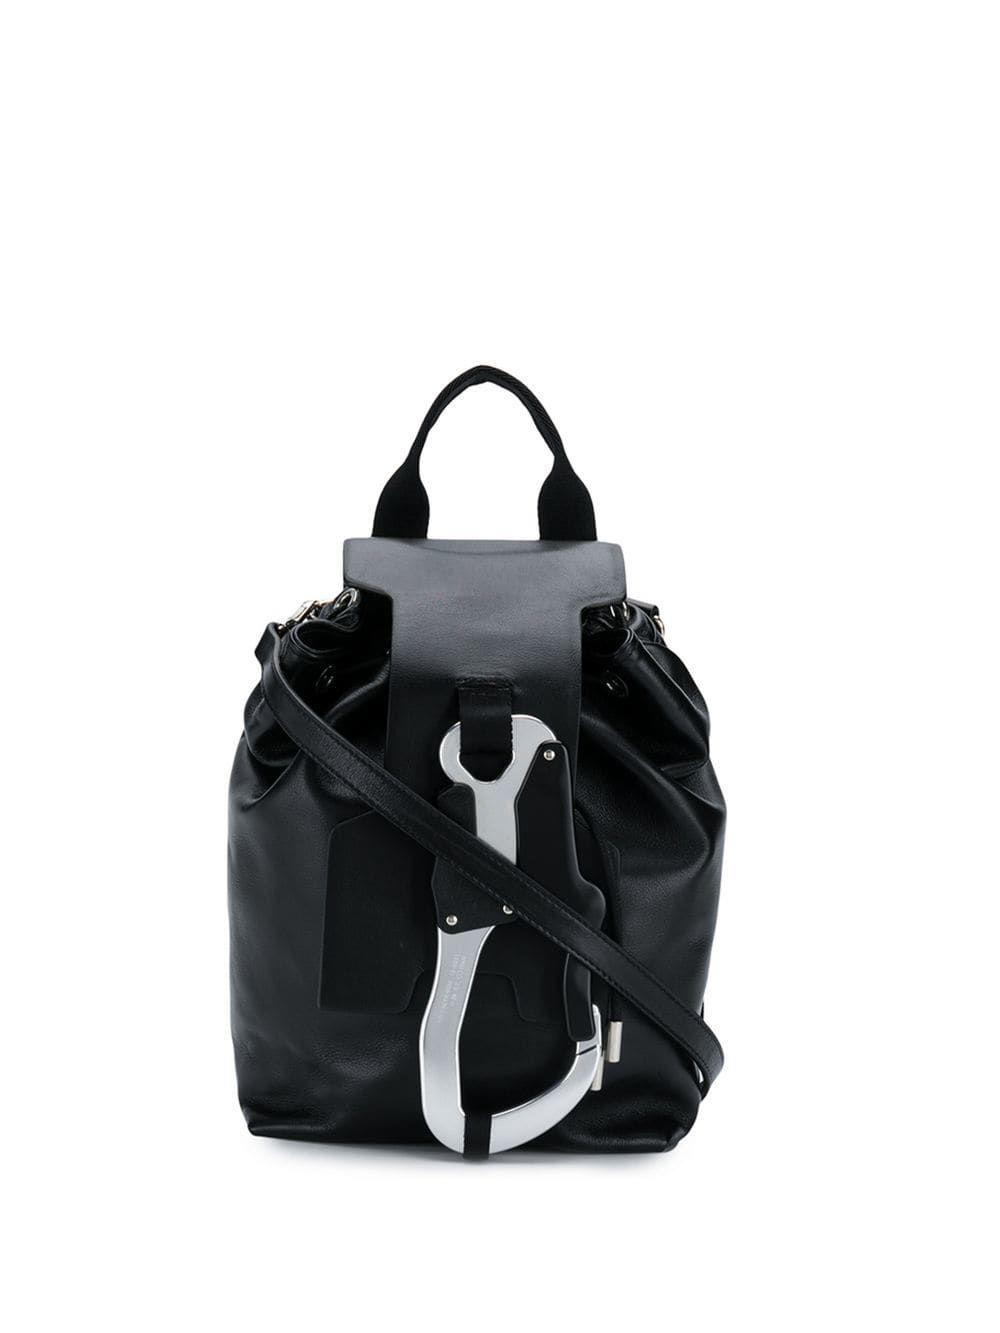 66479b56 ALYX 1017 ALYX 9SM OVERSIZED LOCK BACKPACK - SCHWARZ. #alyx #bags #leather # backpacks #cotton